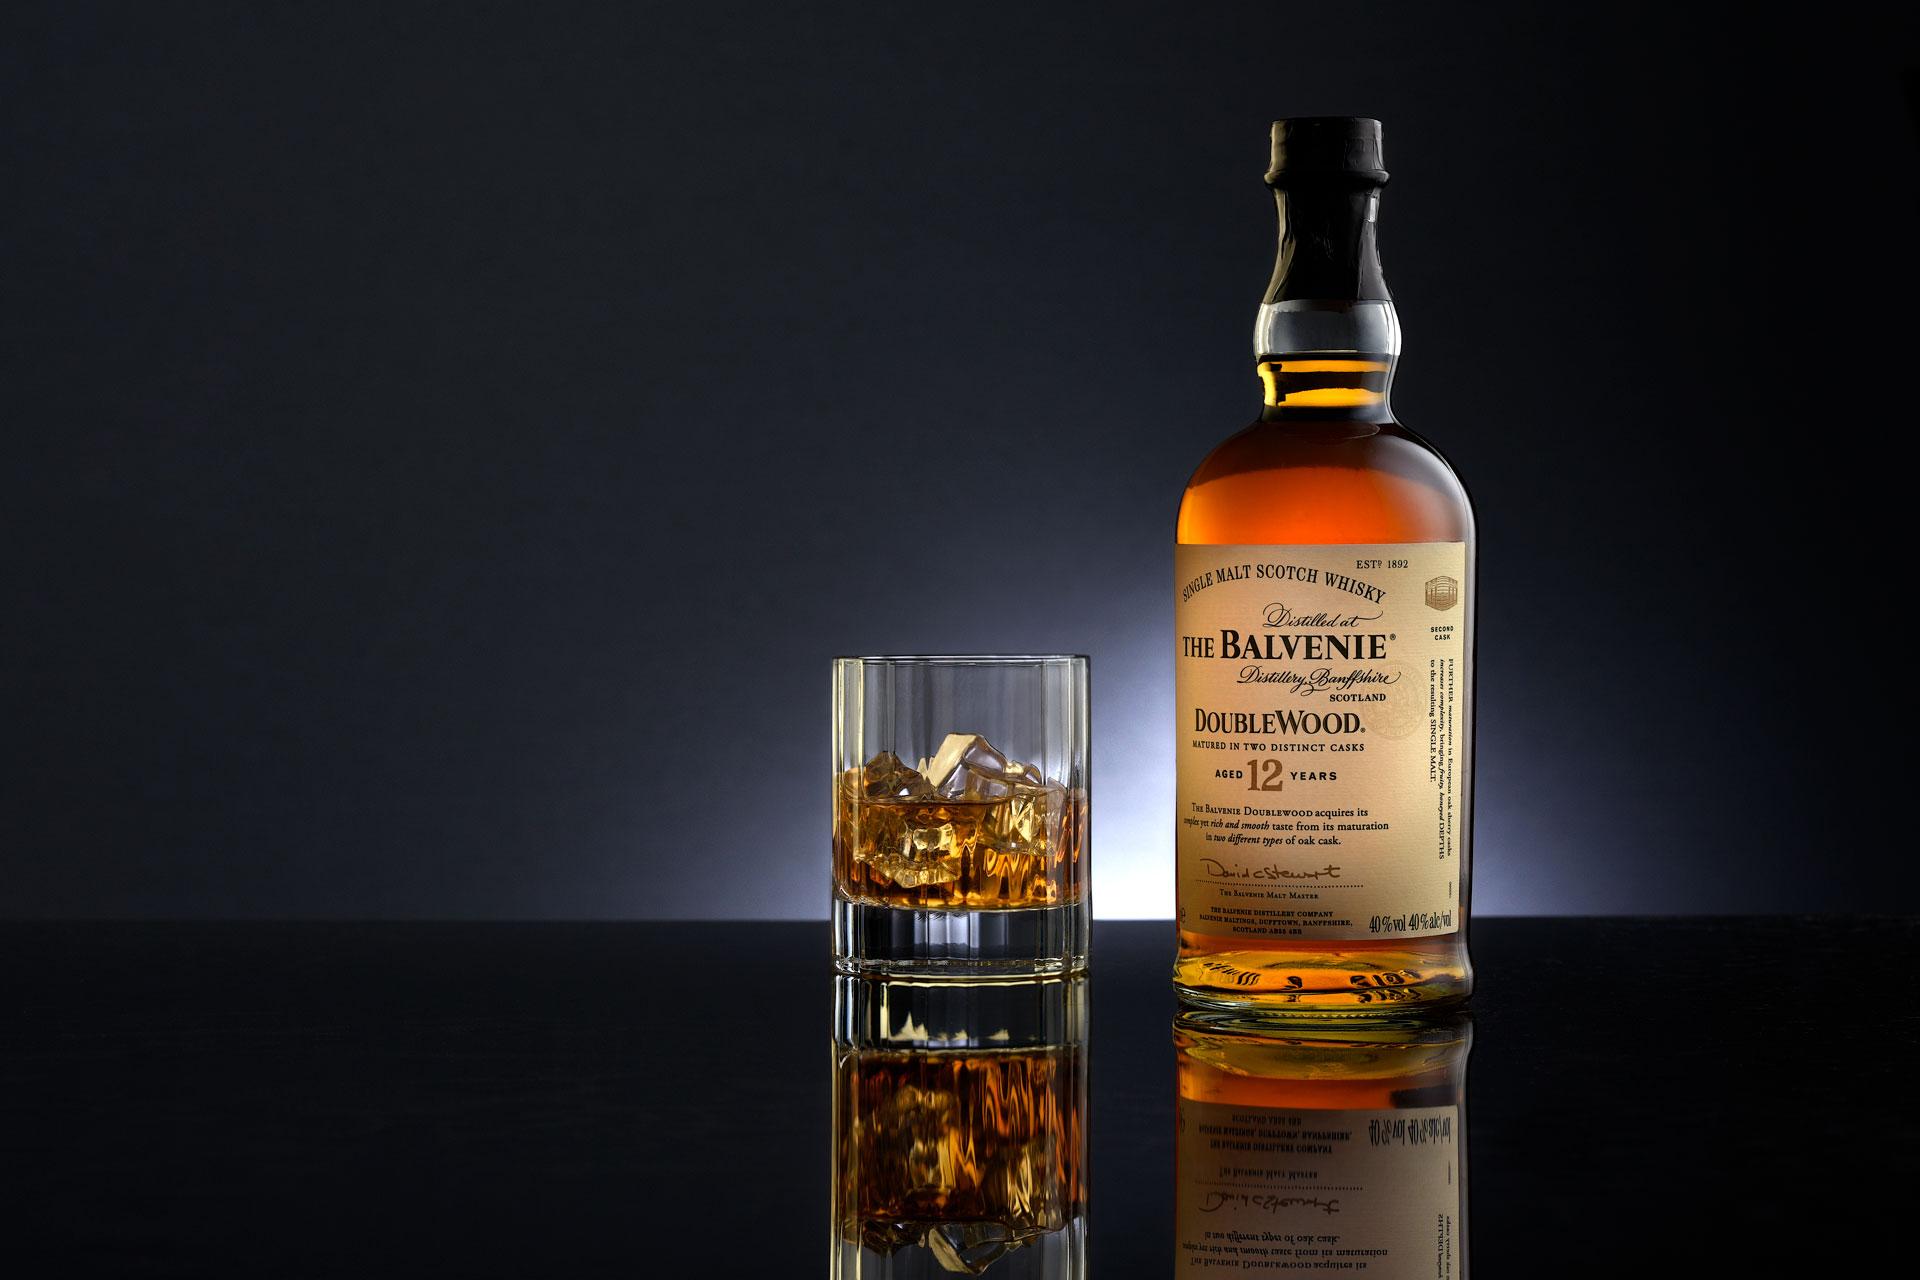 Balvenie Whisky Productfotografie